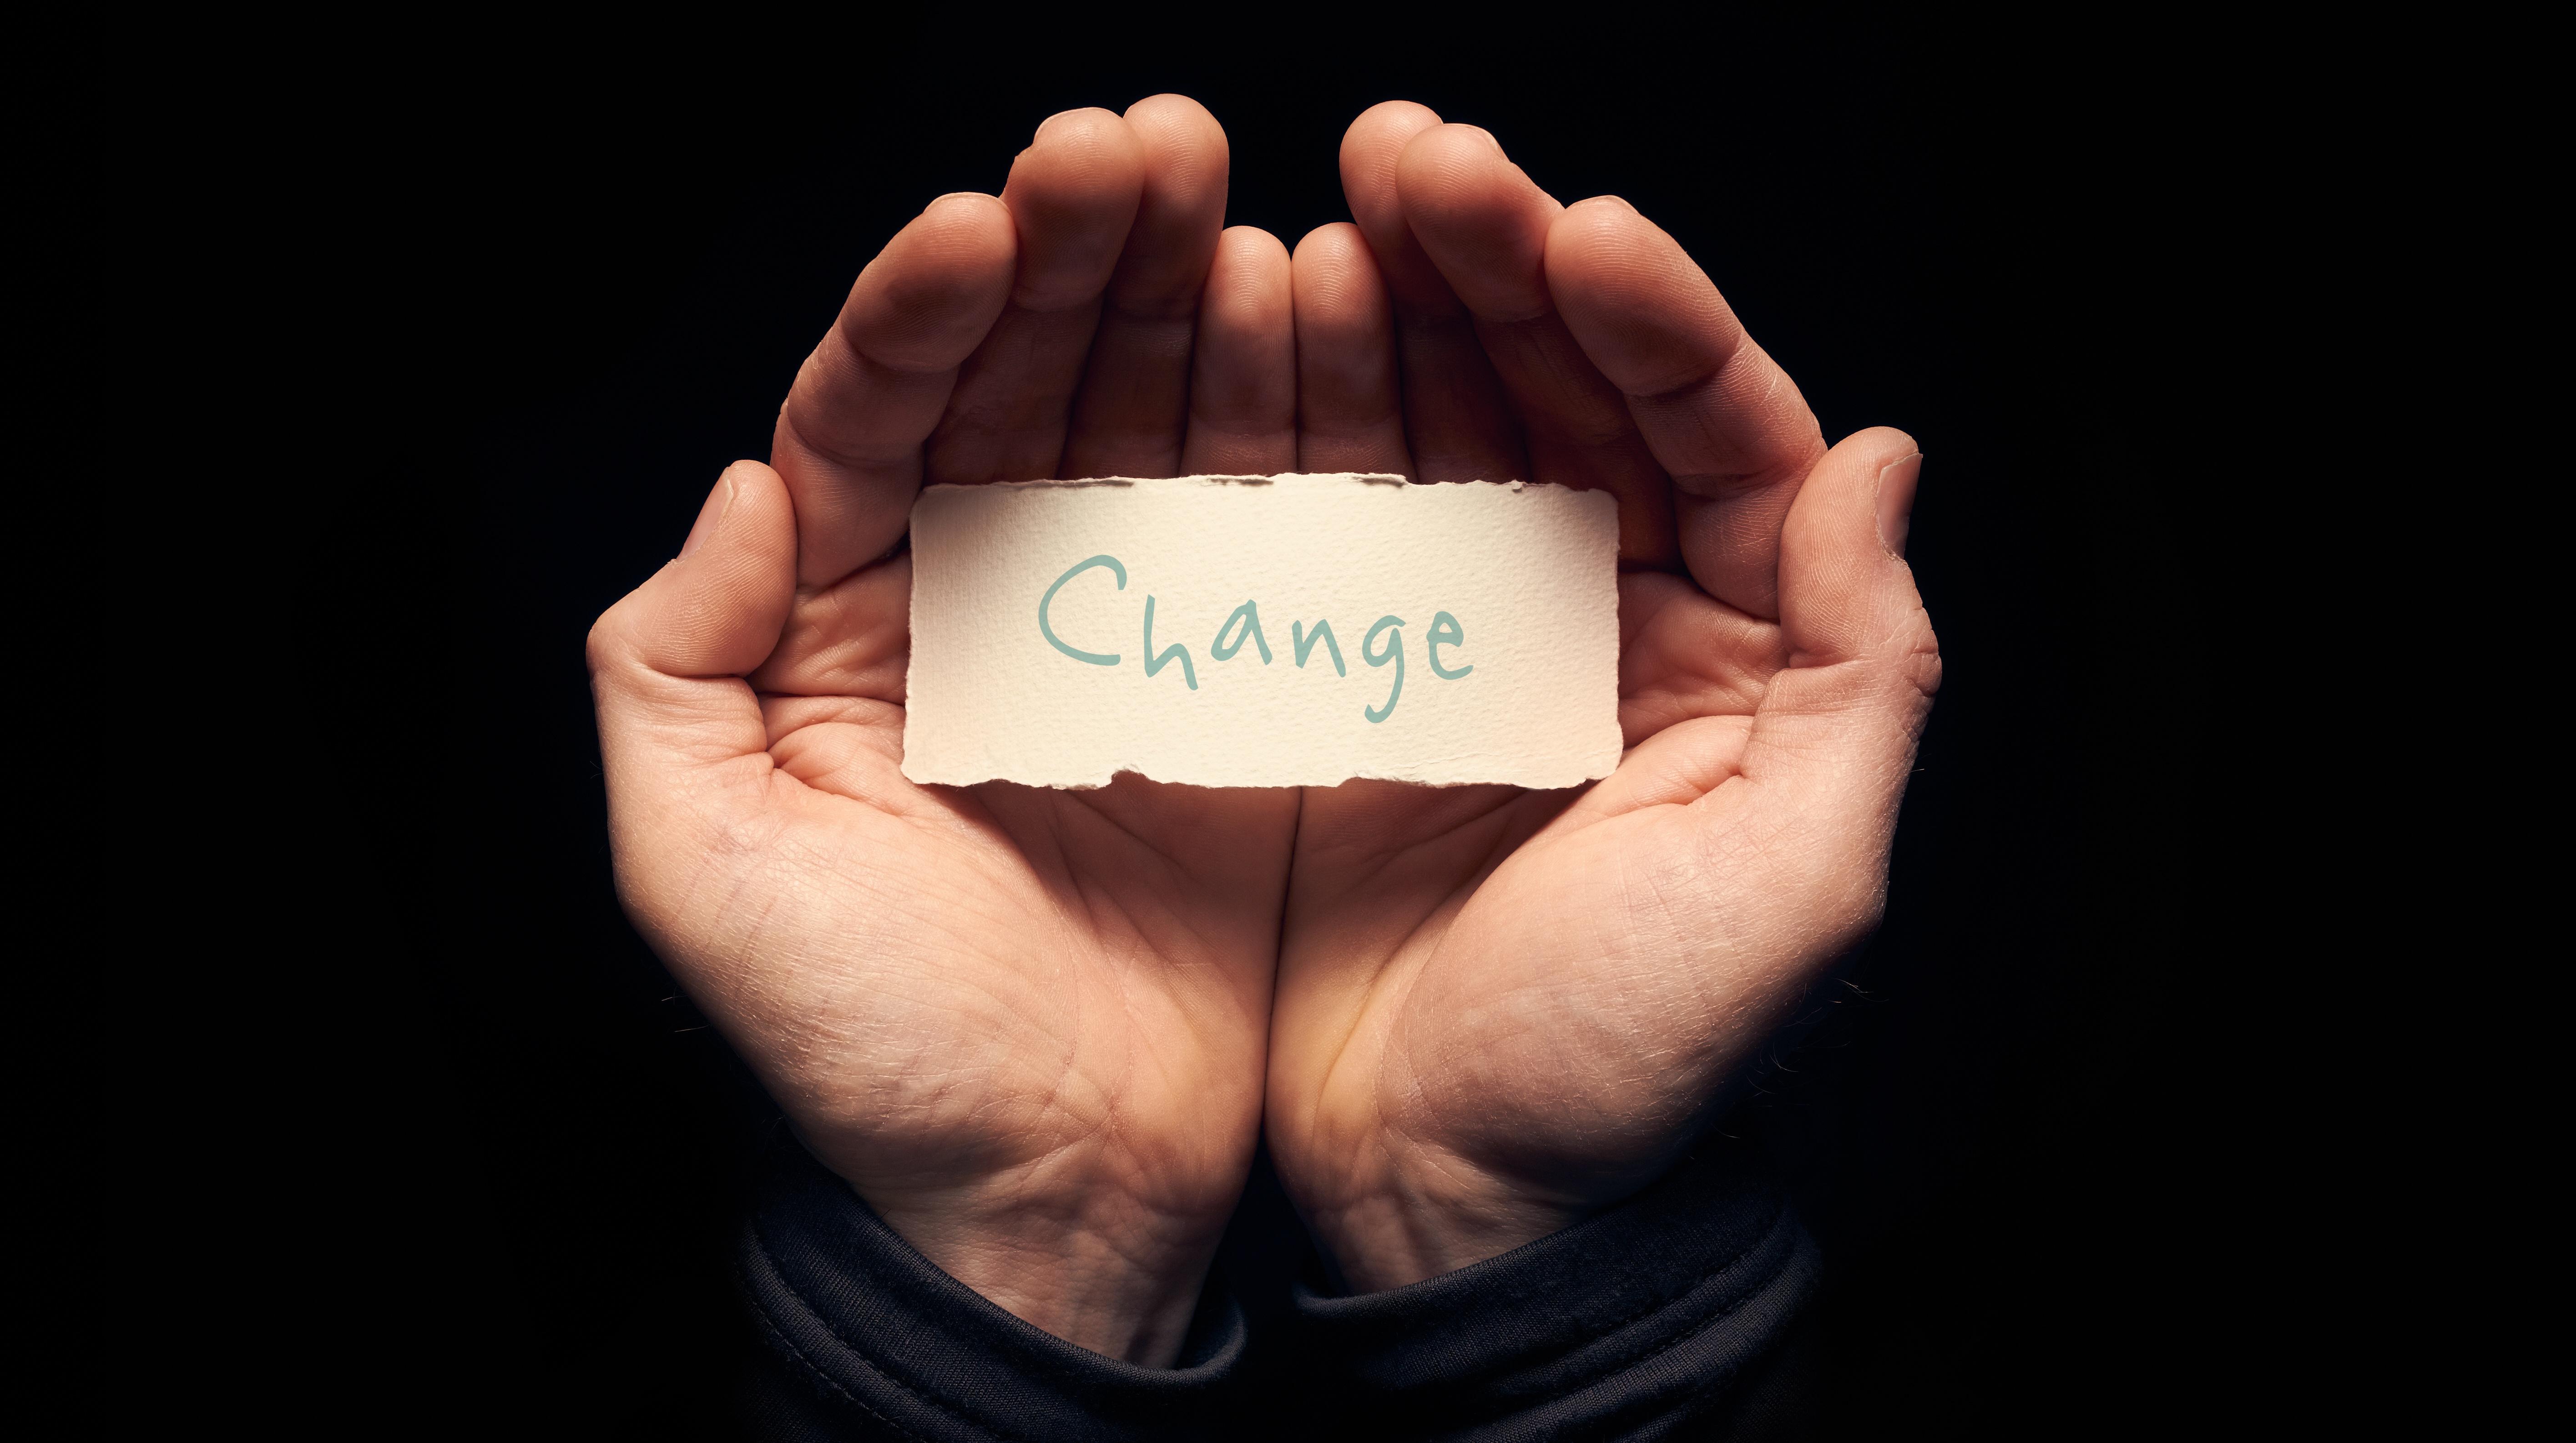 change in hands.jpeg